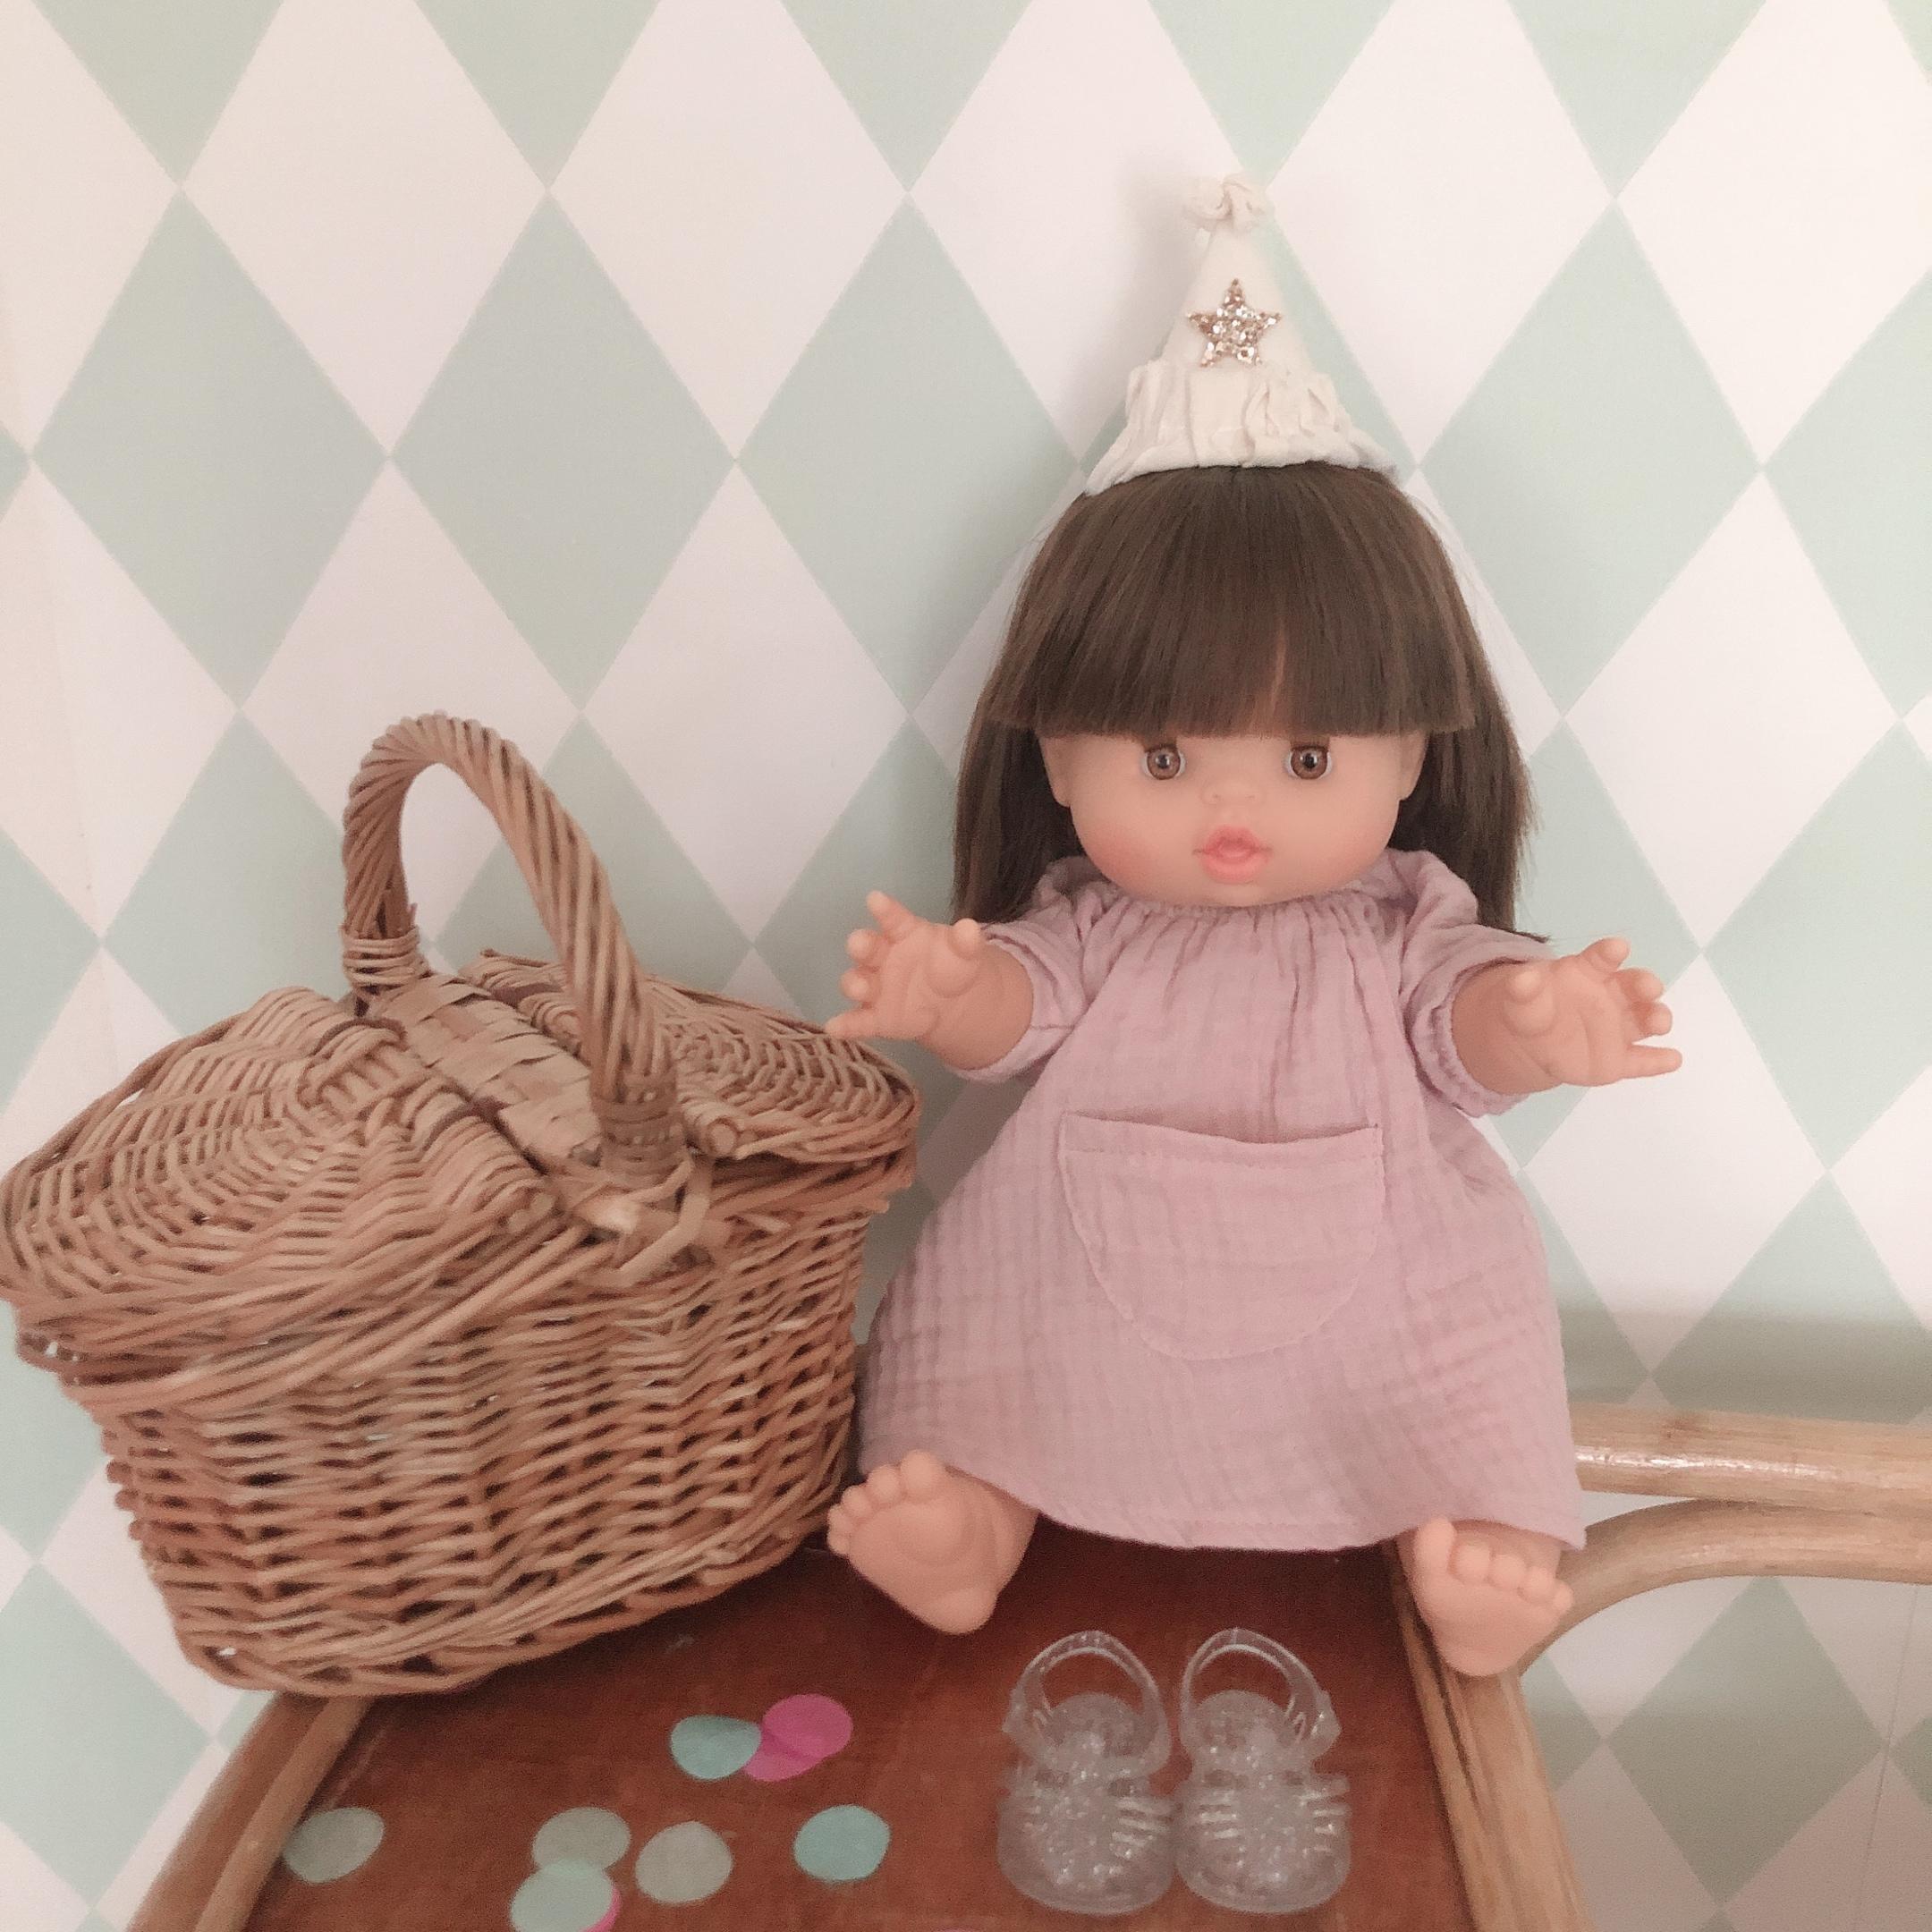 Doll Picnic Basket